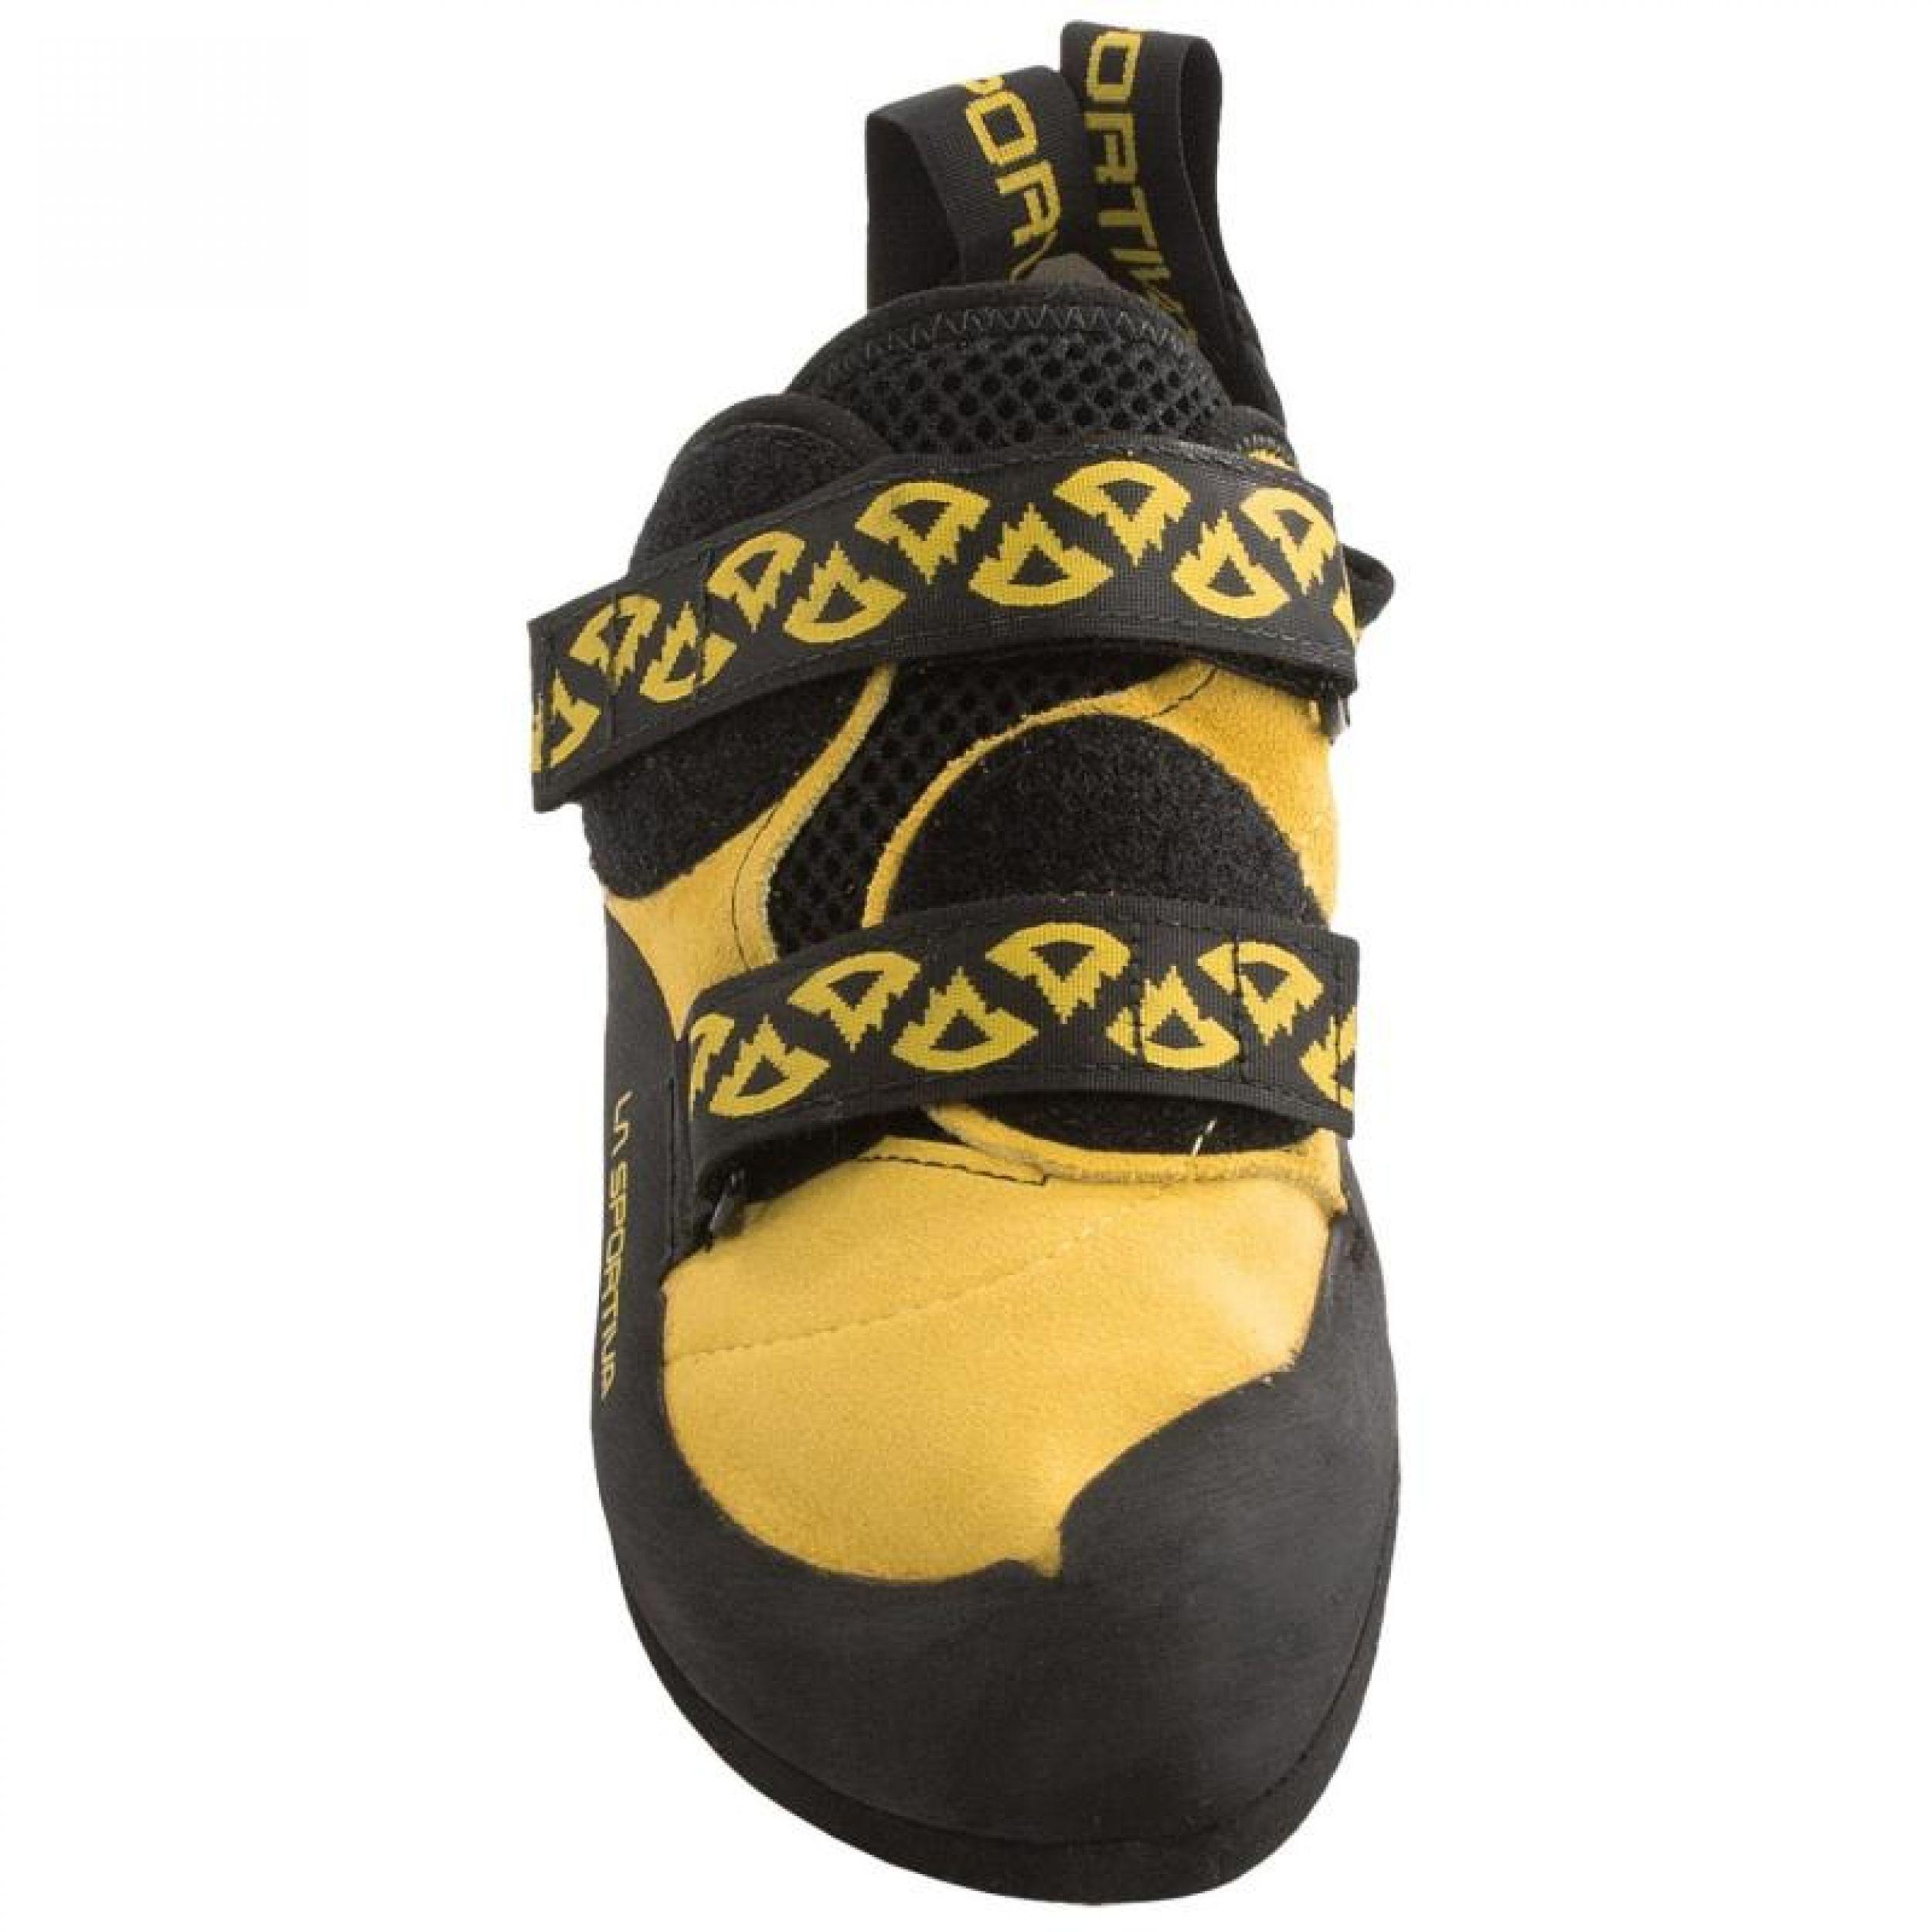 la-sportiva-katana-climbing-shoes-for-men-and-women-a-8411m_2-1500.1.jpg